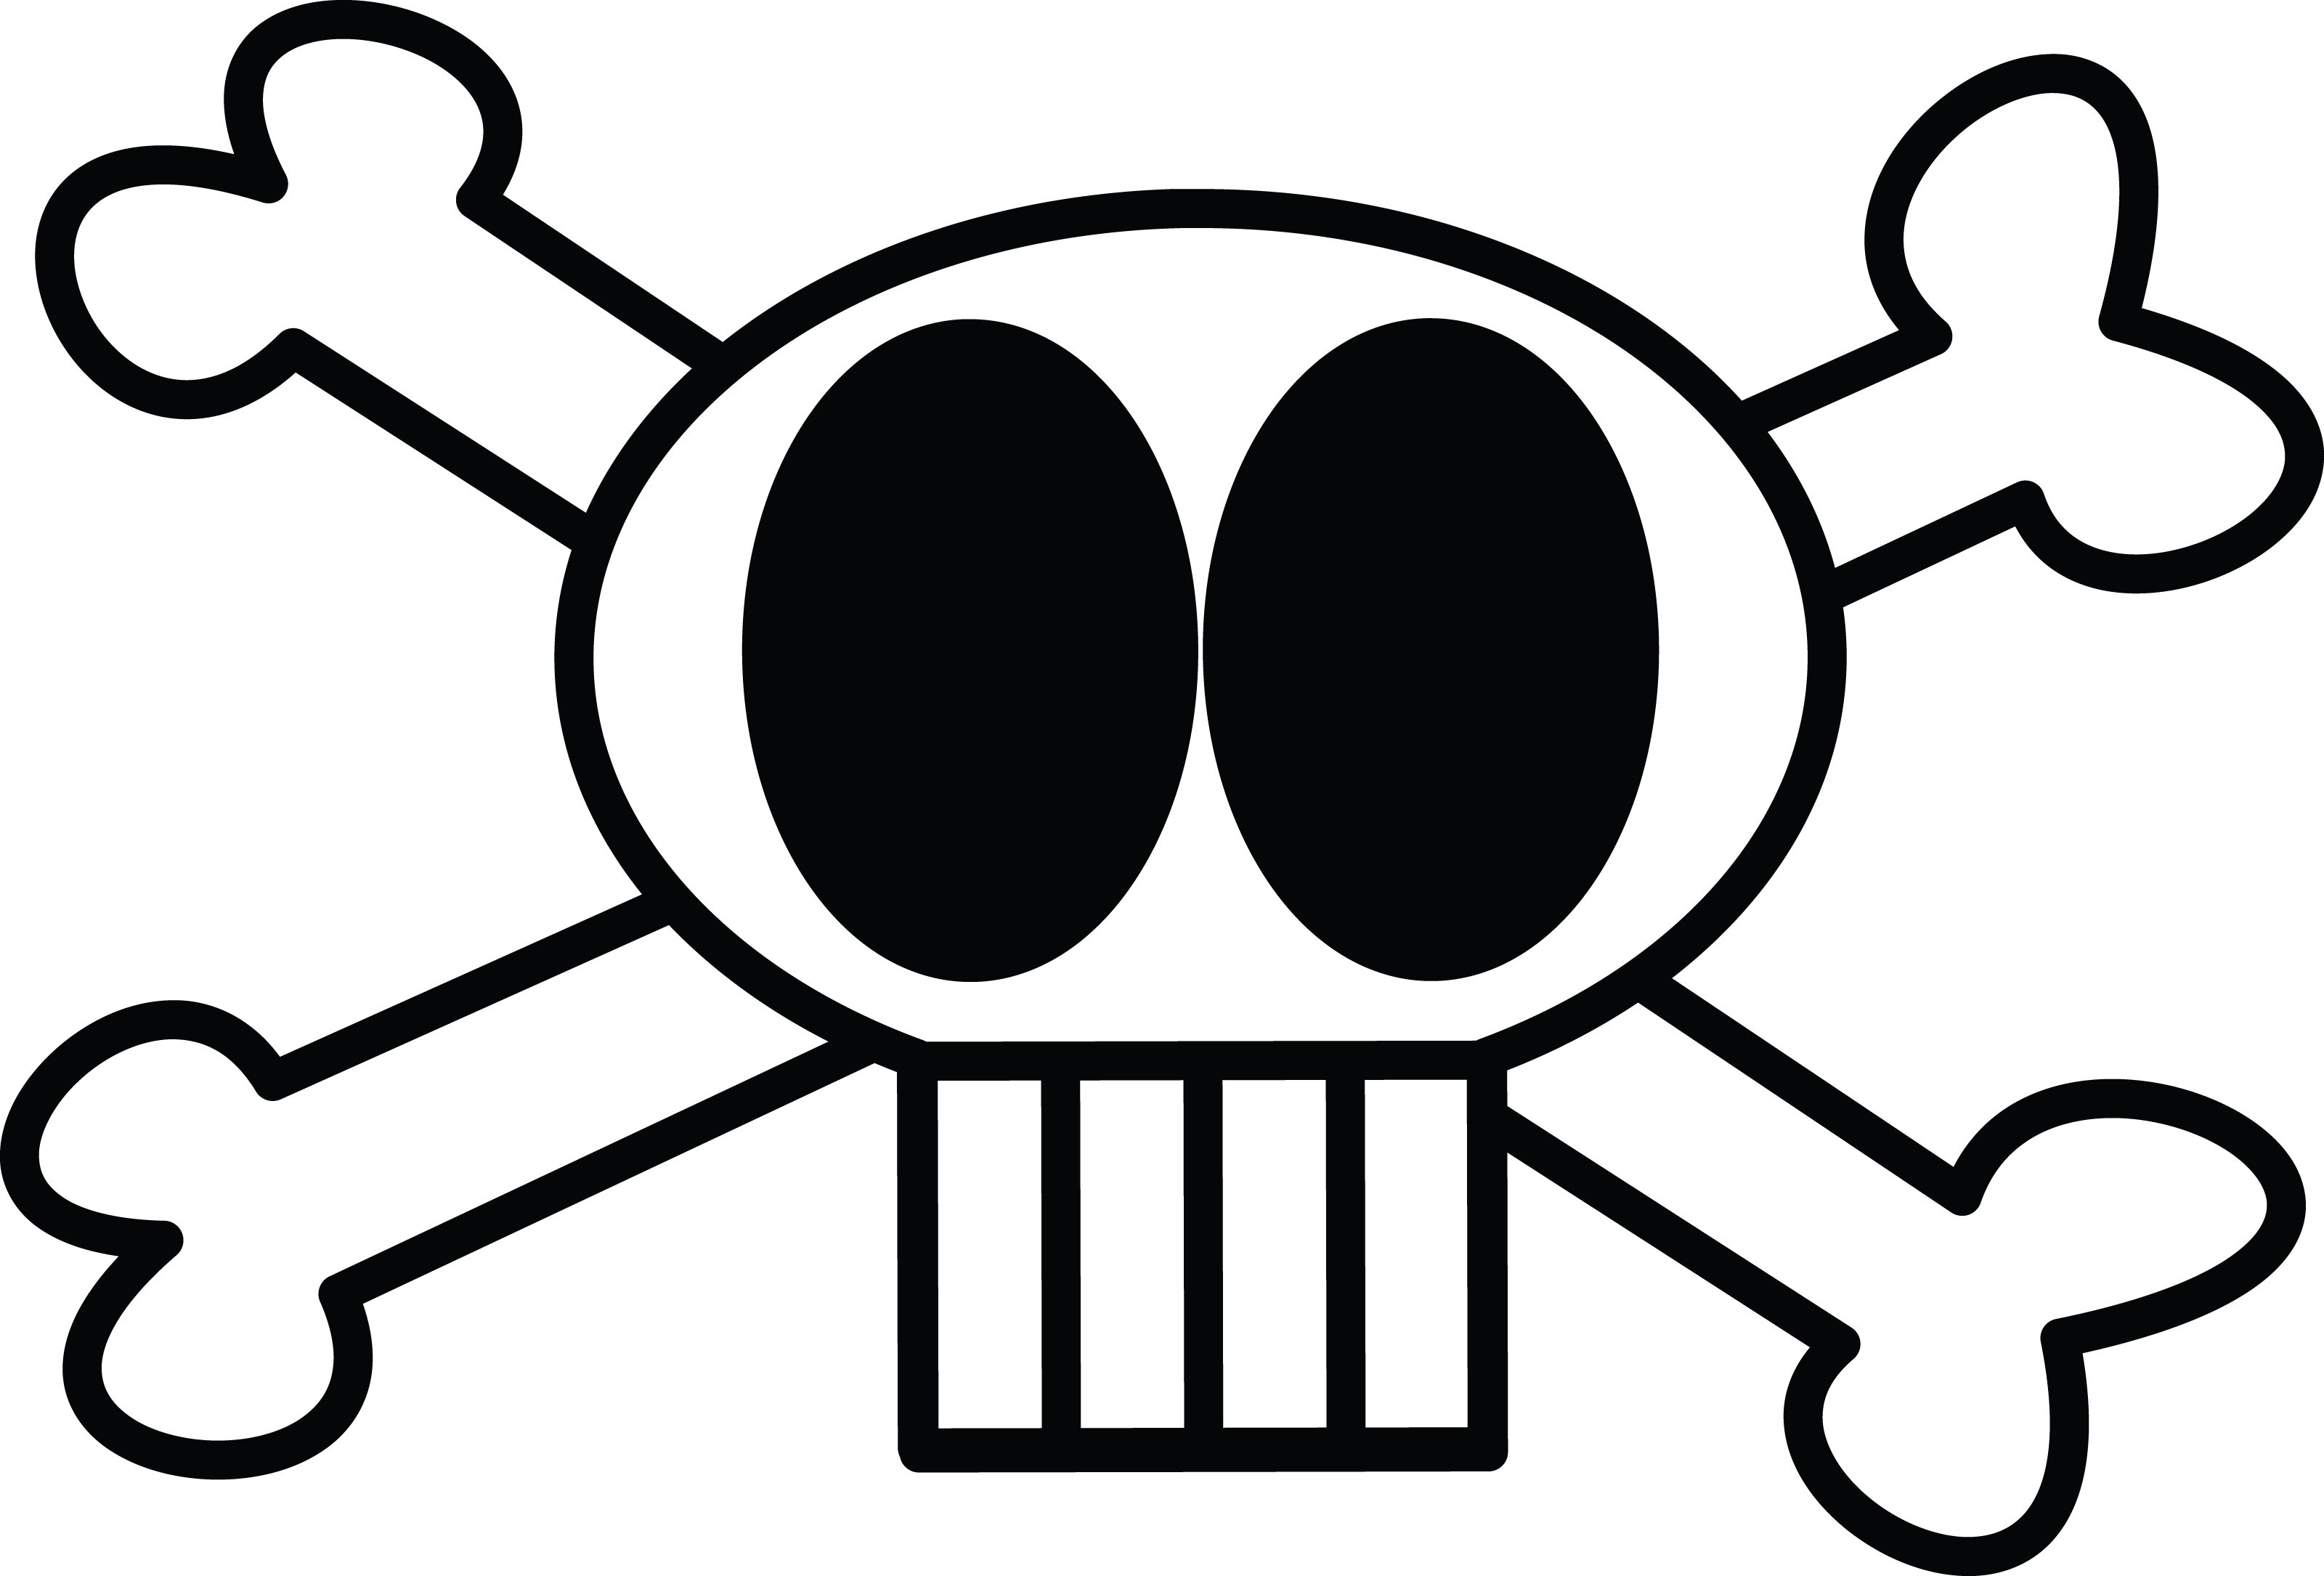 Free Clipart Illustration Of Skull And Crossbones